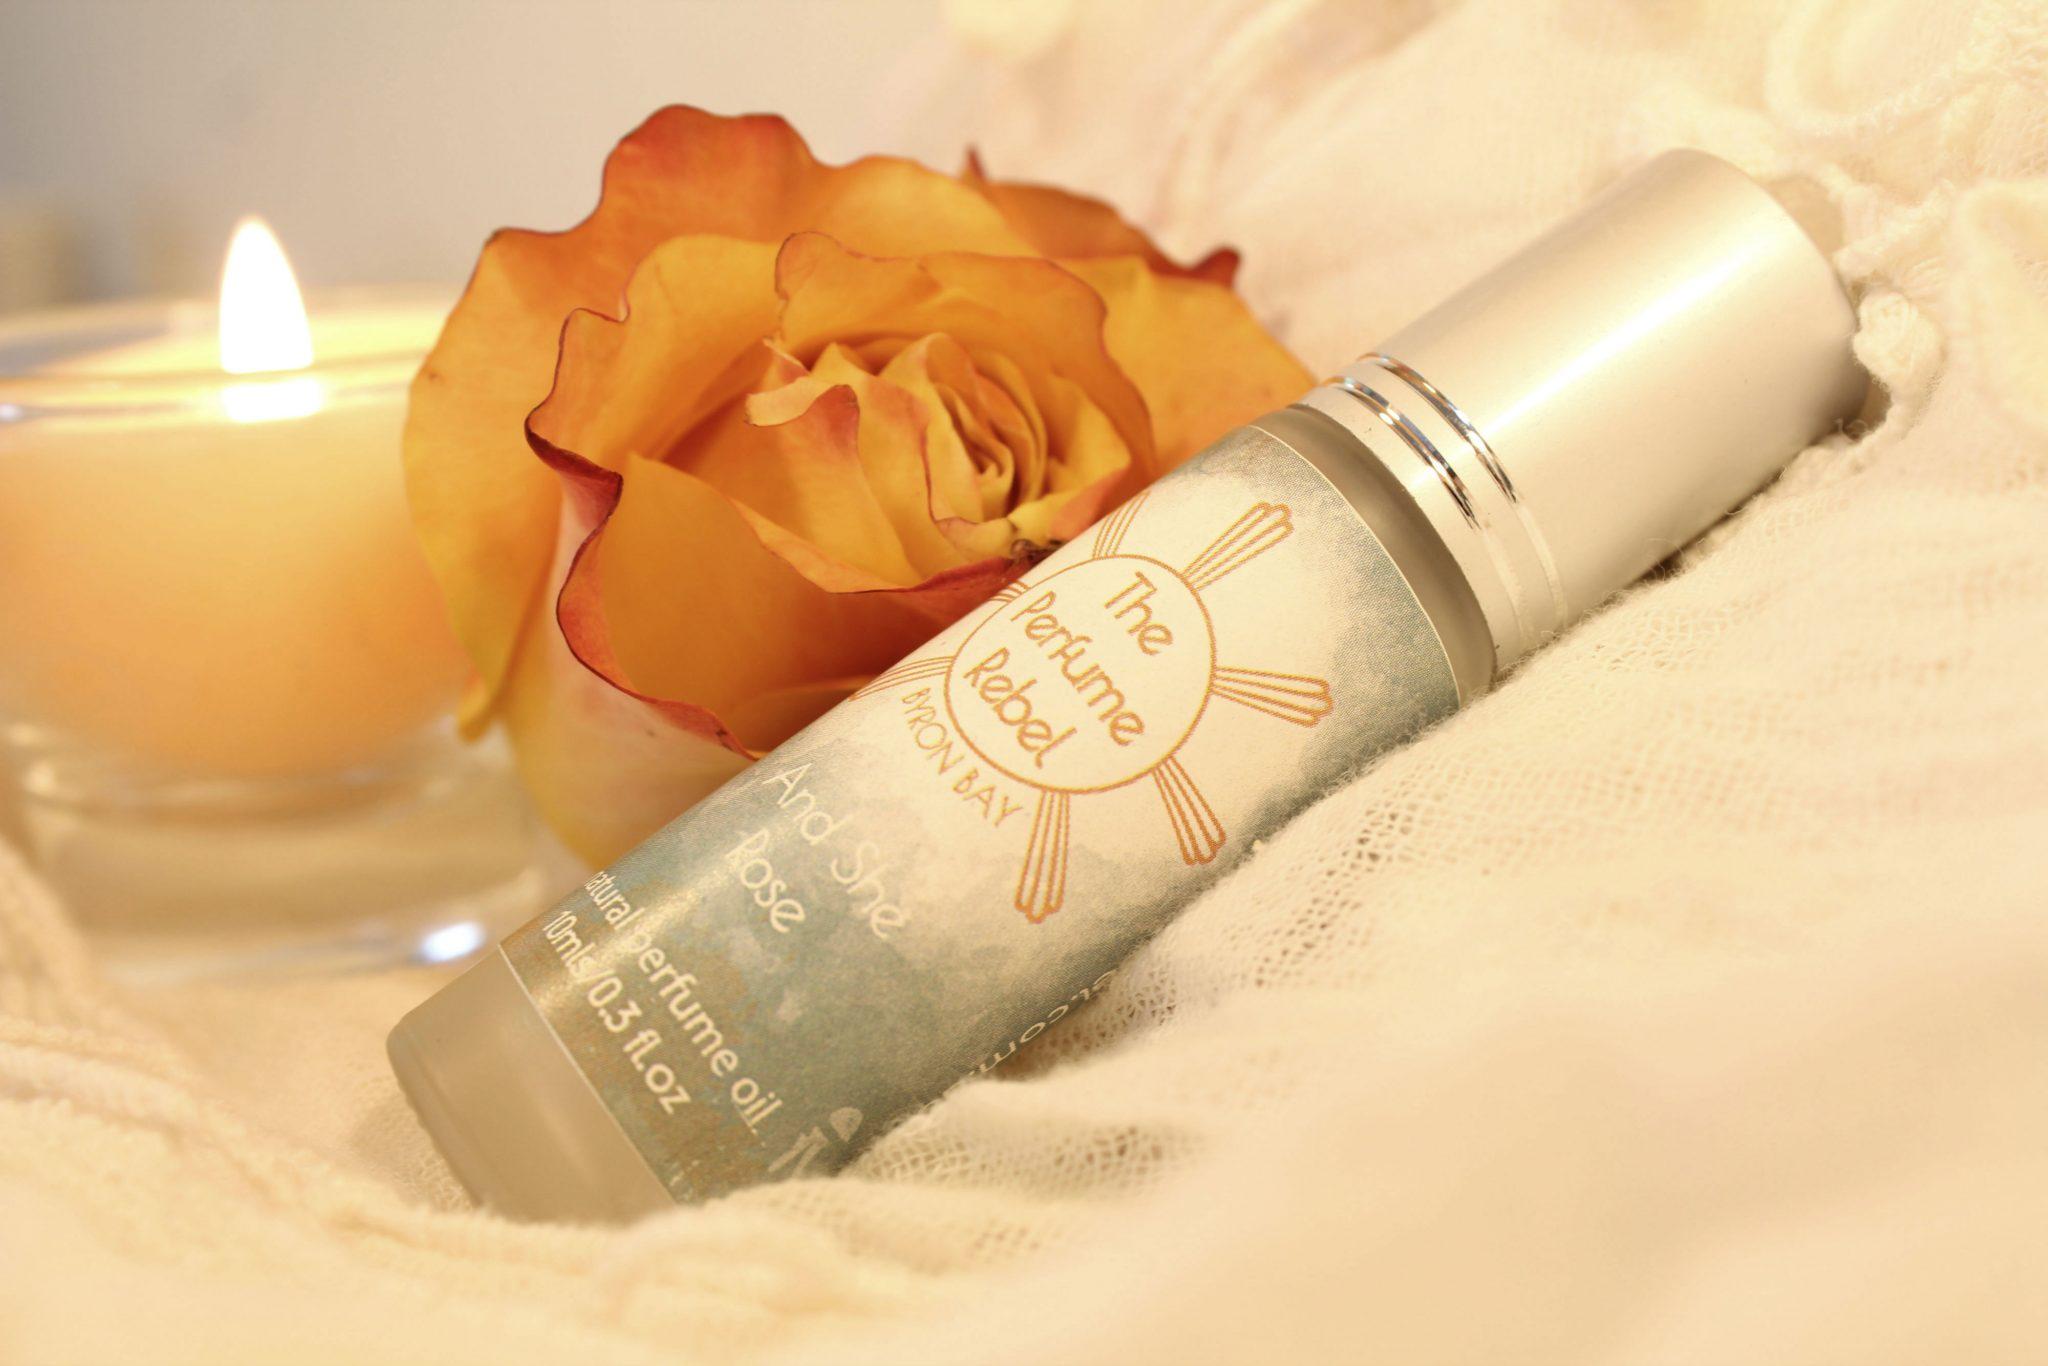 Natural Perfume - And She Rose